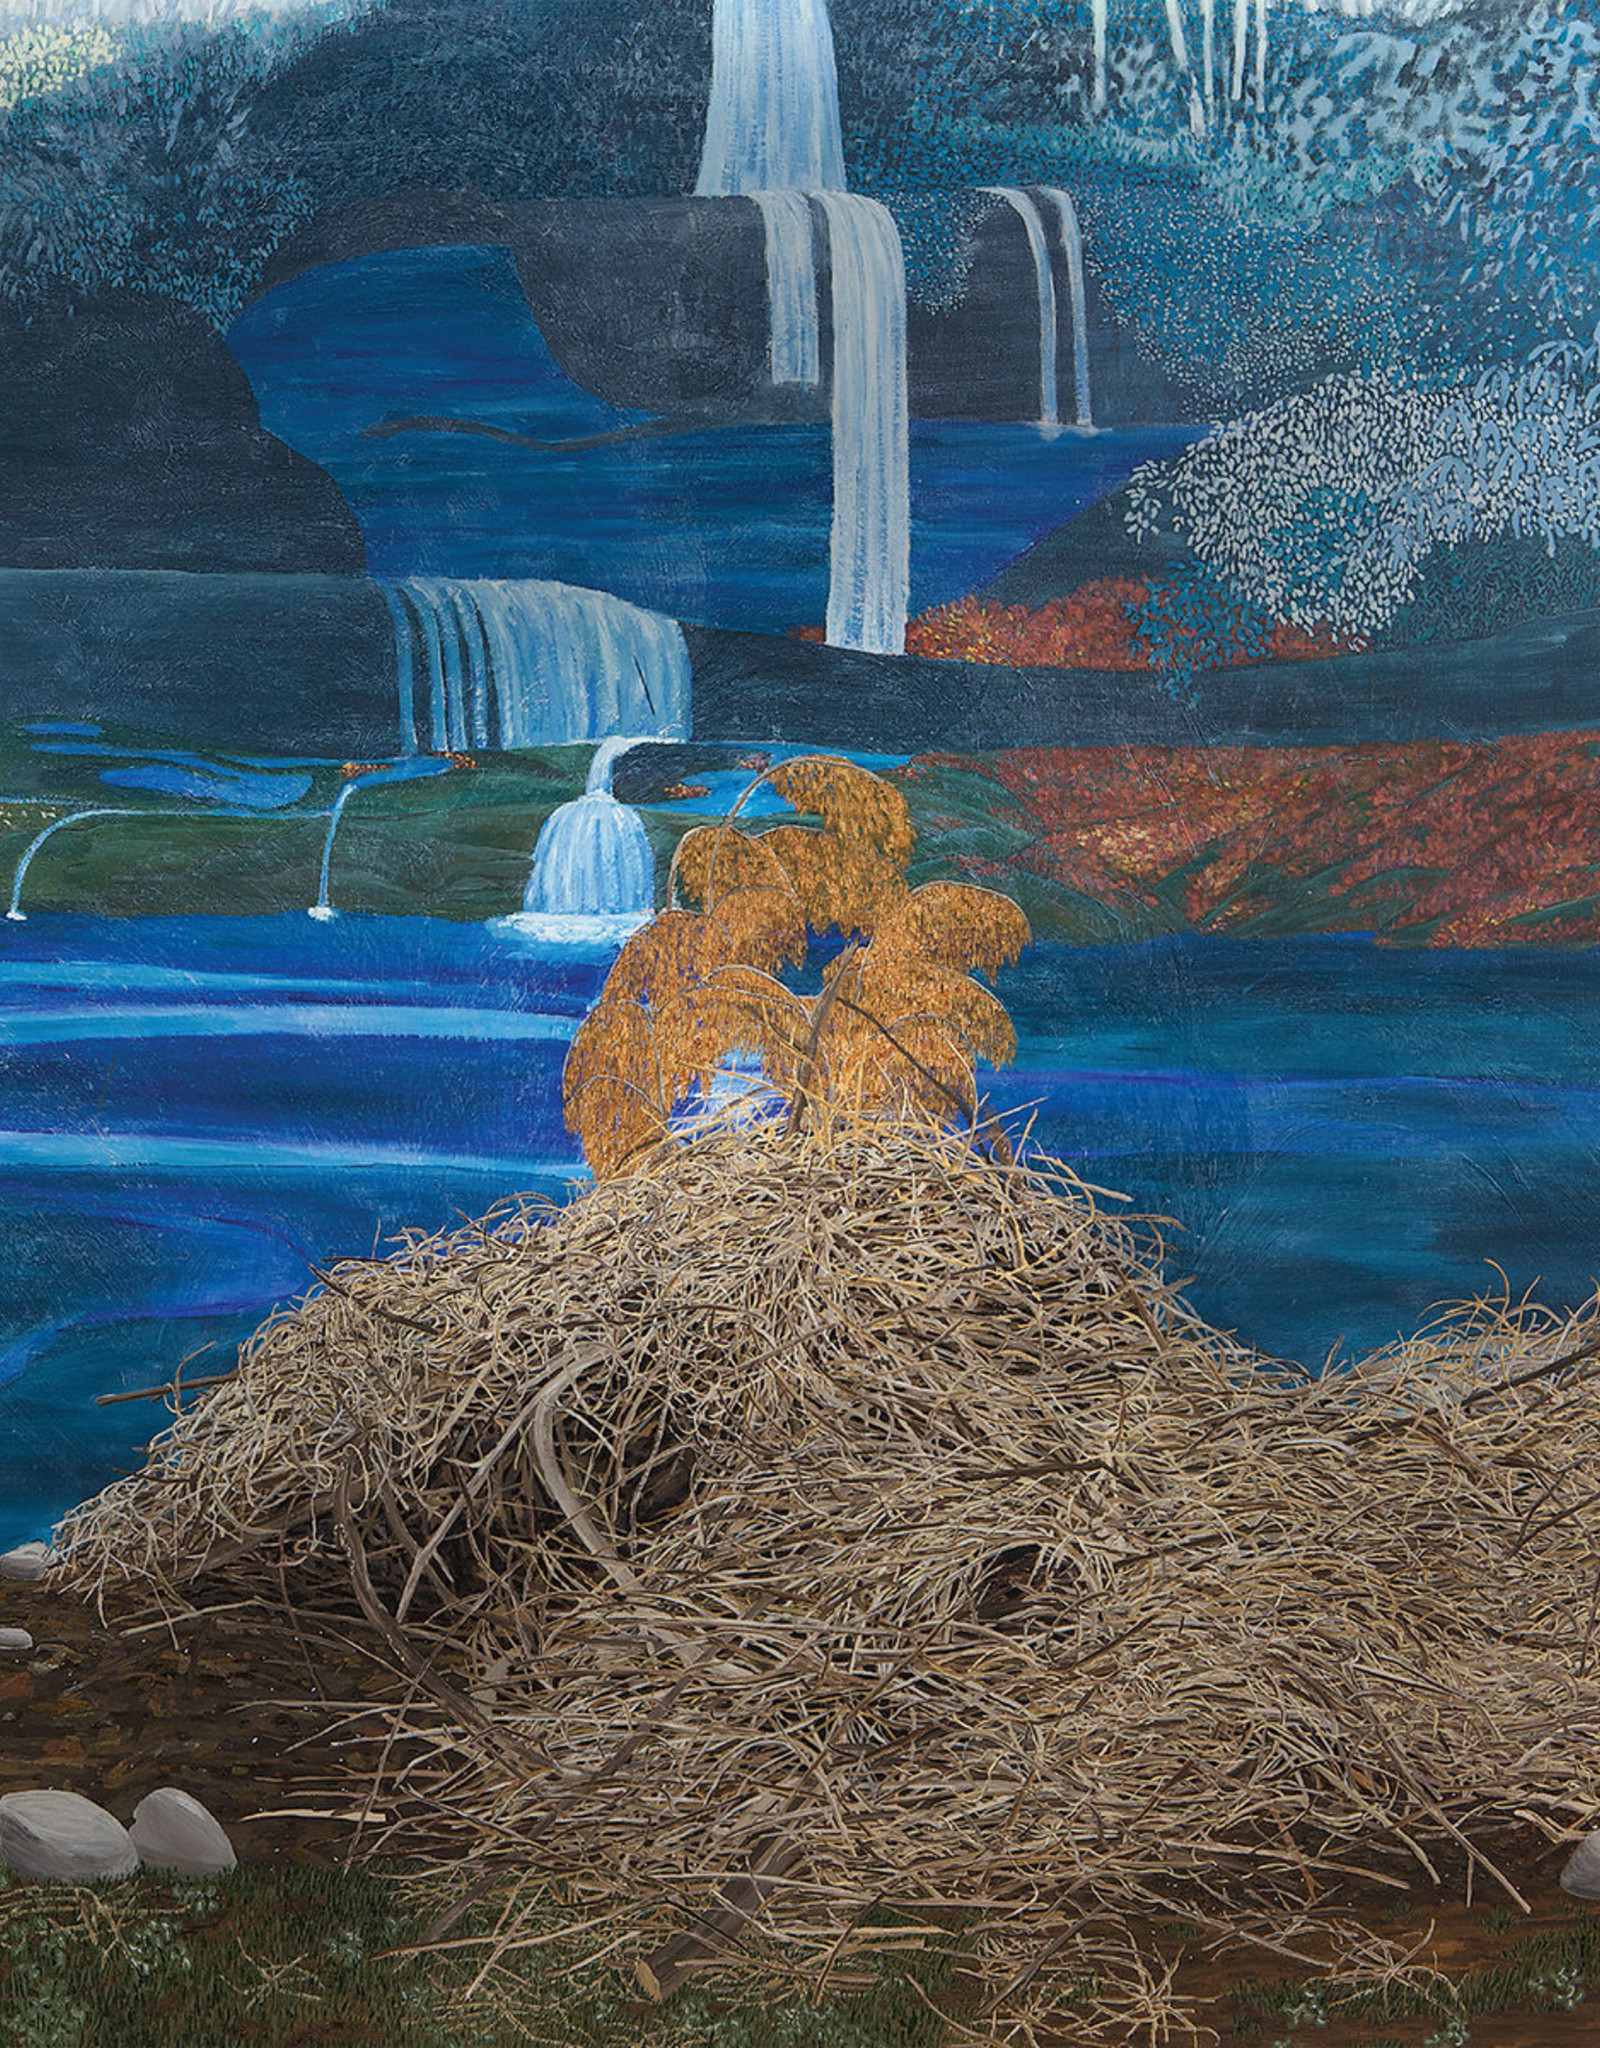 Mary Lattimore - At the Dam